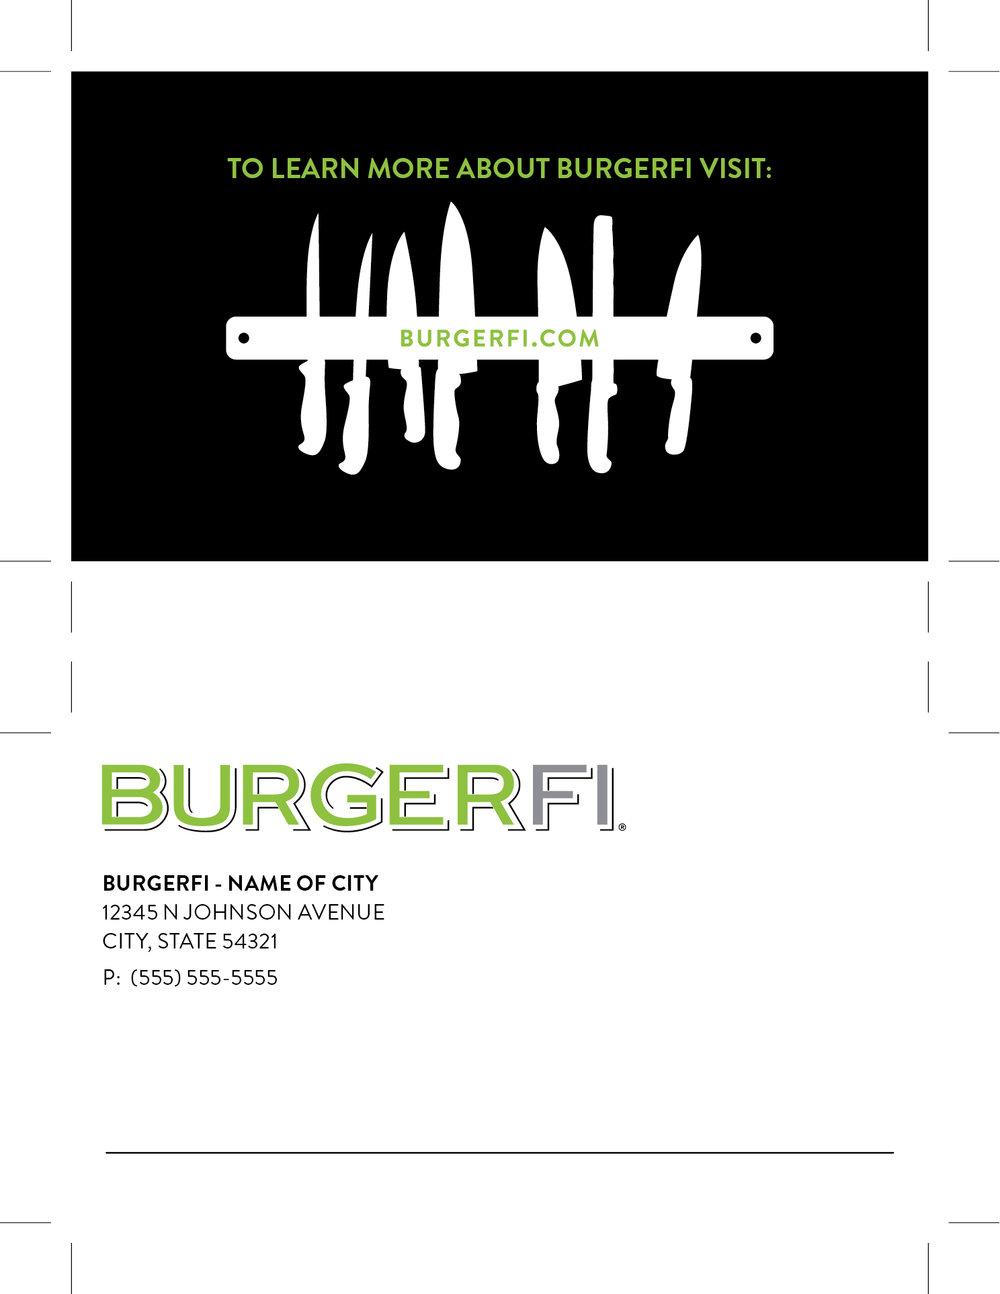 burgerfi2.jpg